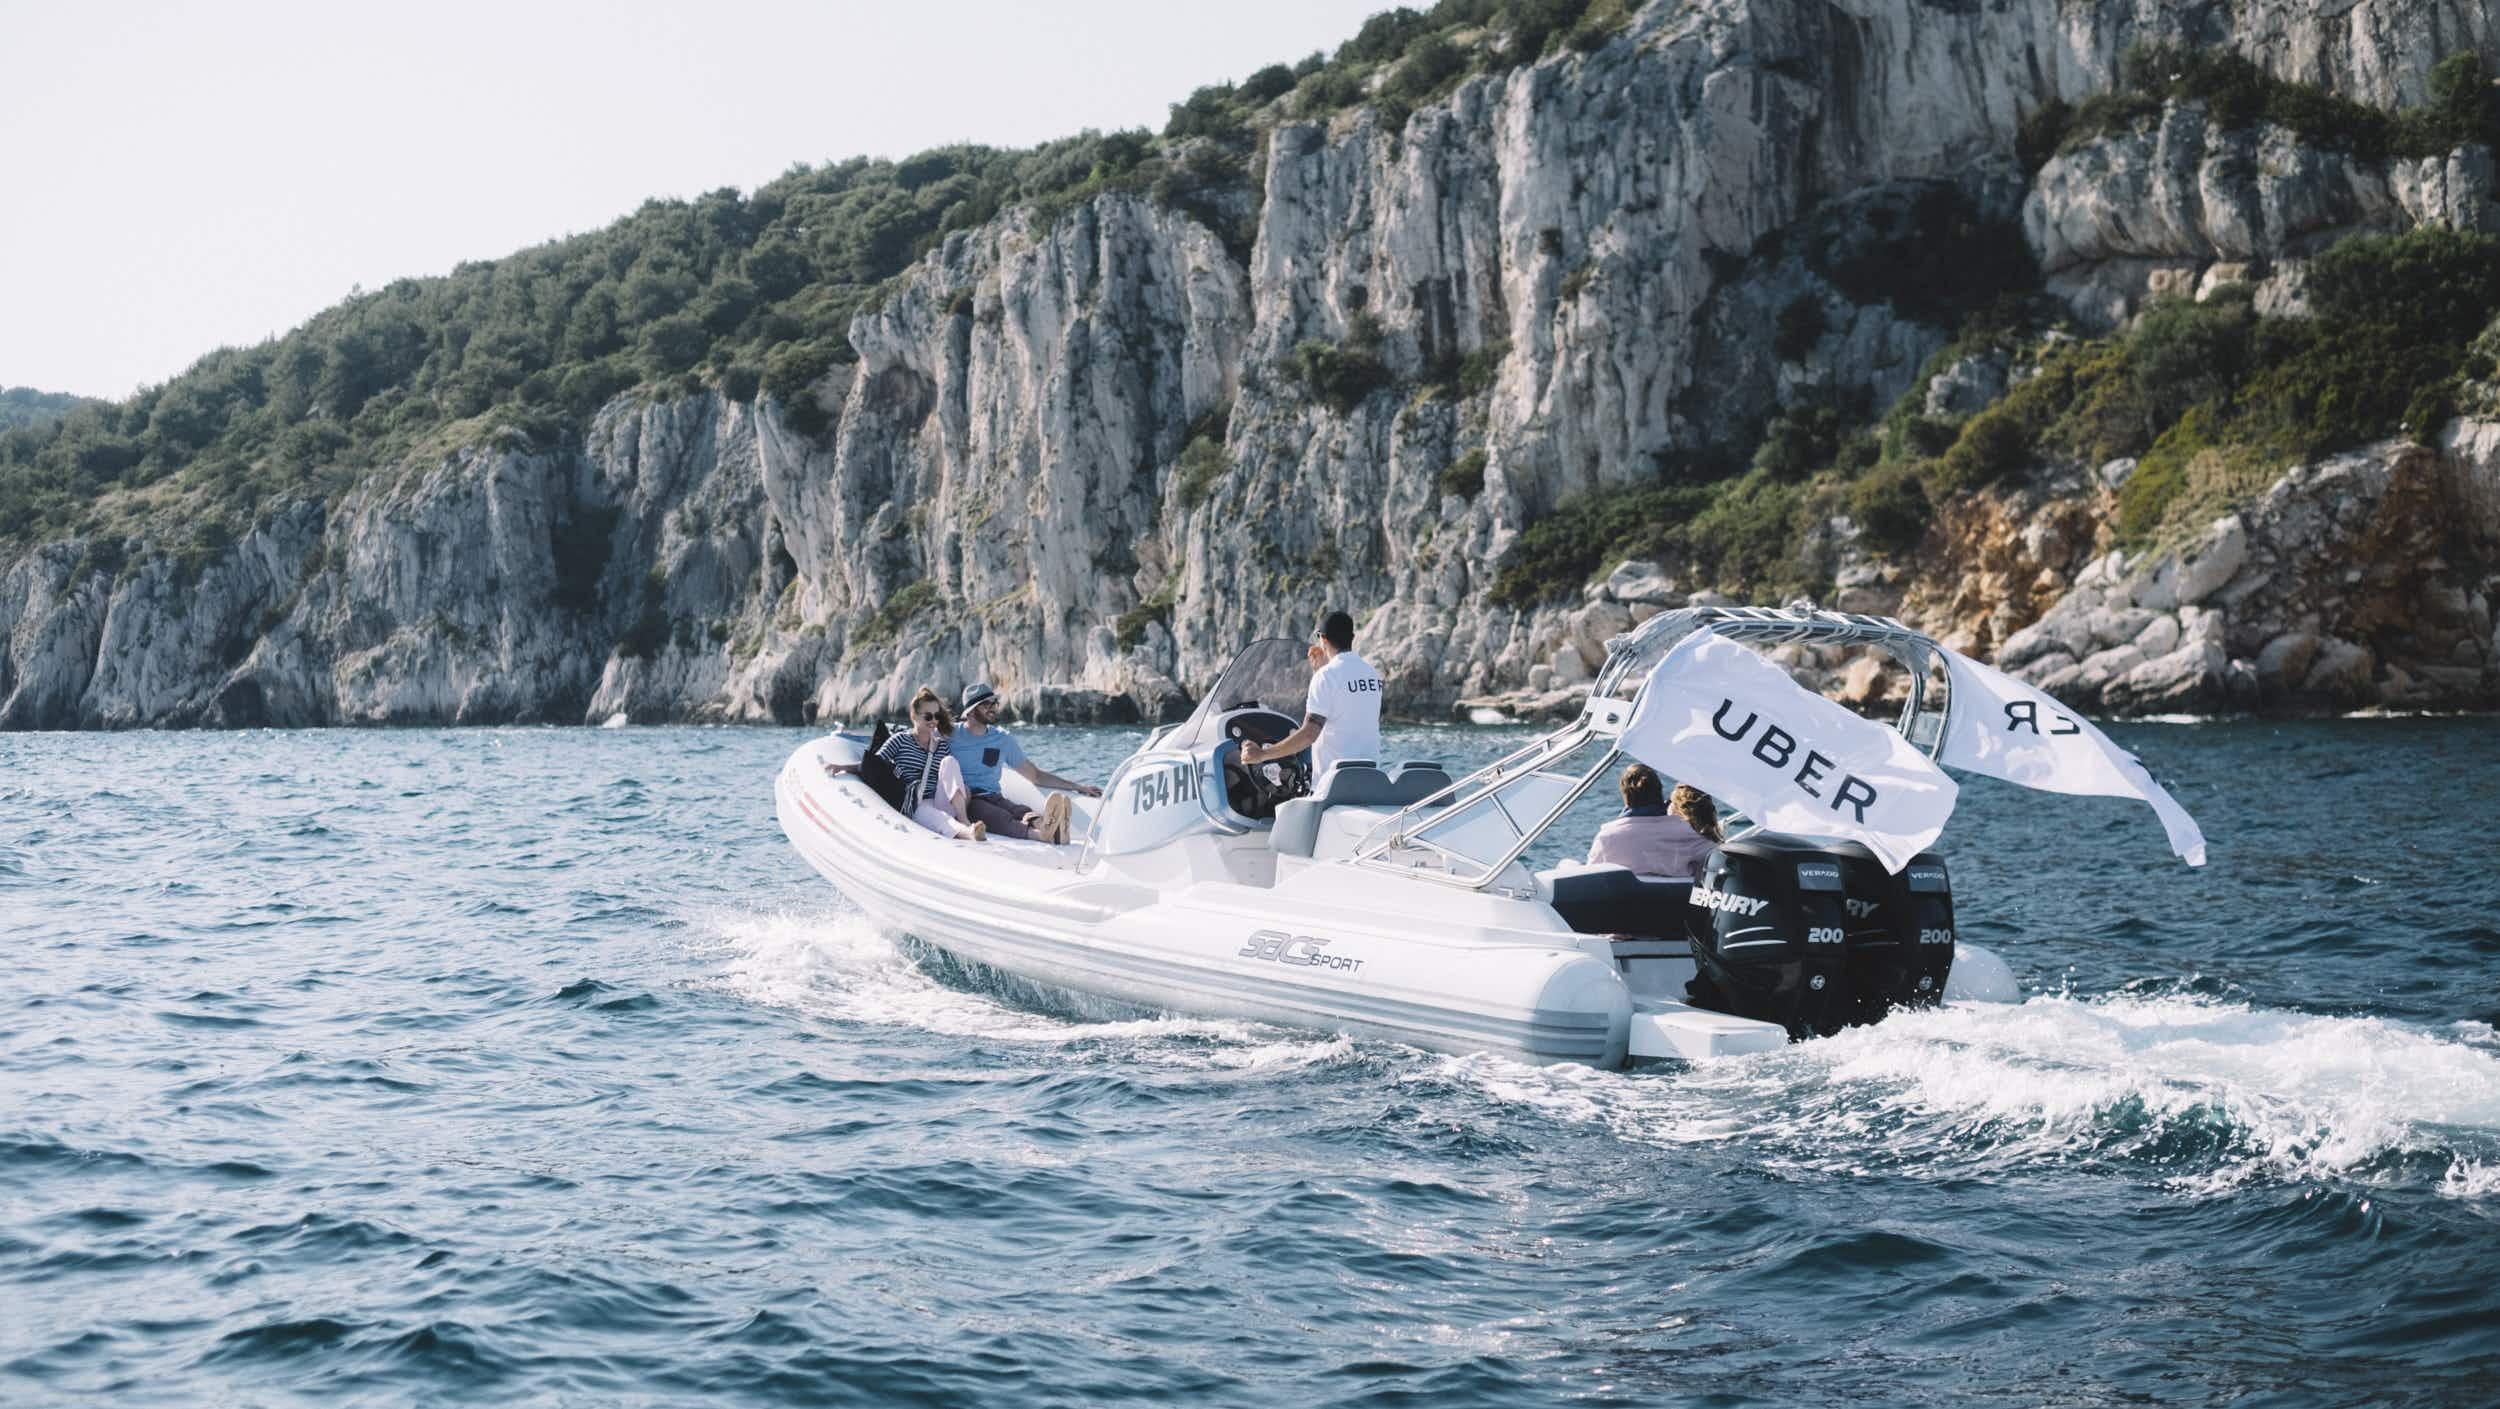 Explore the Croatian coastline and islands in an UberBoat